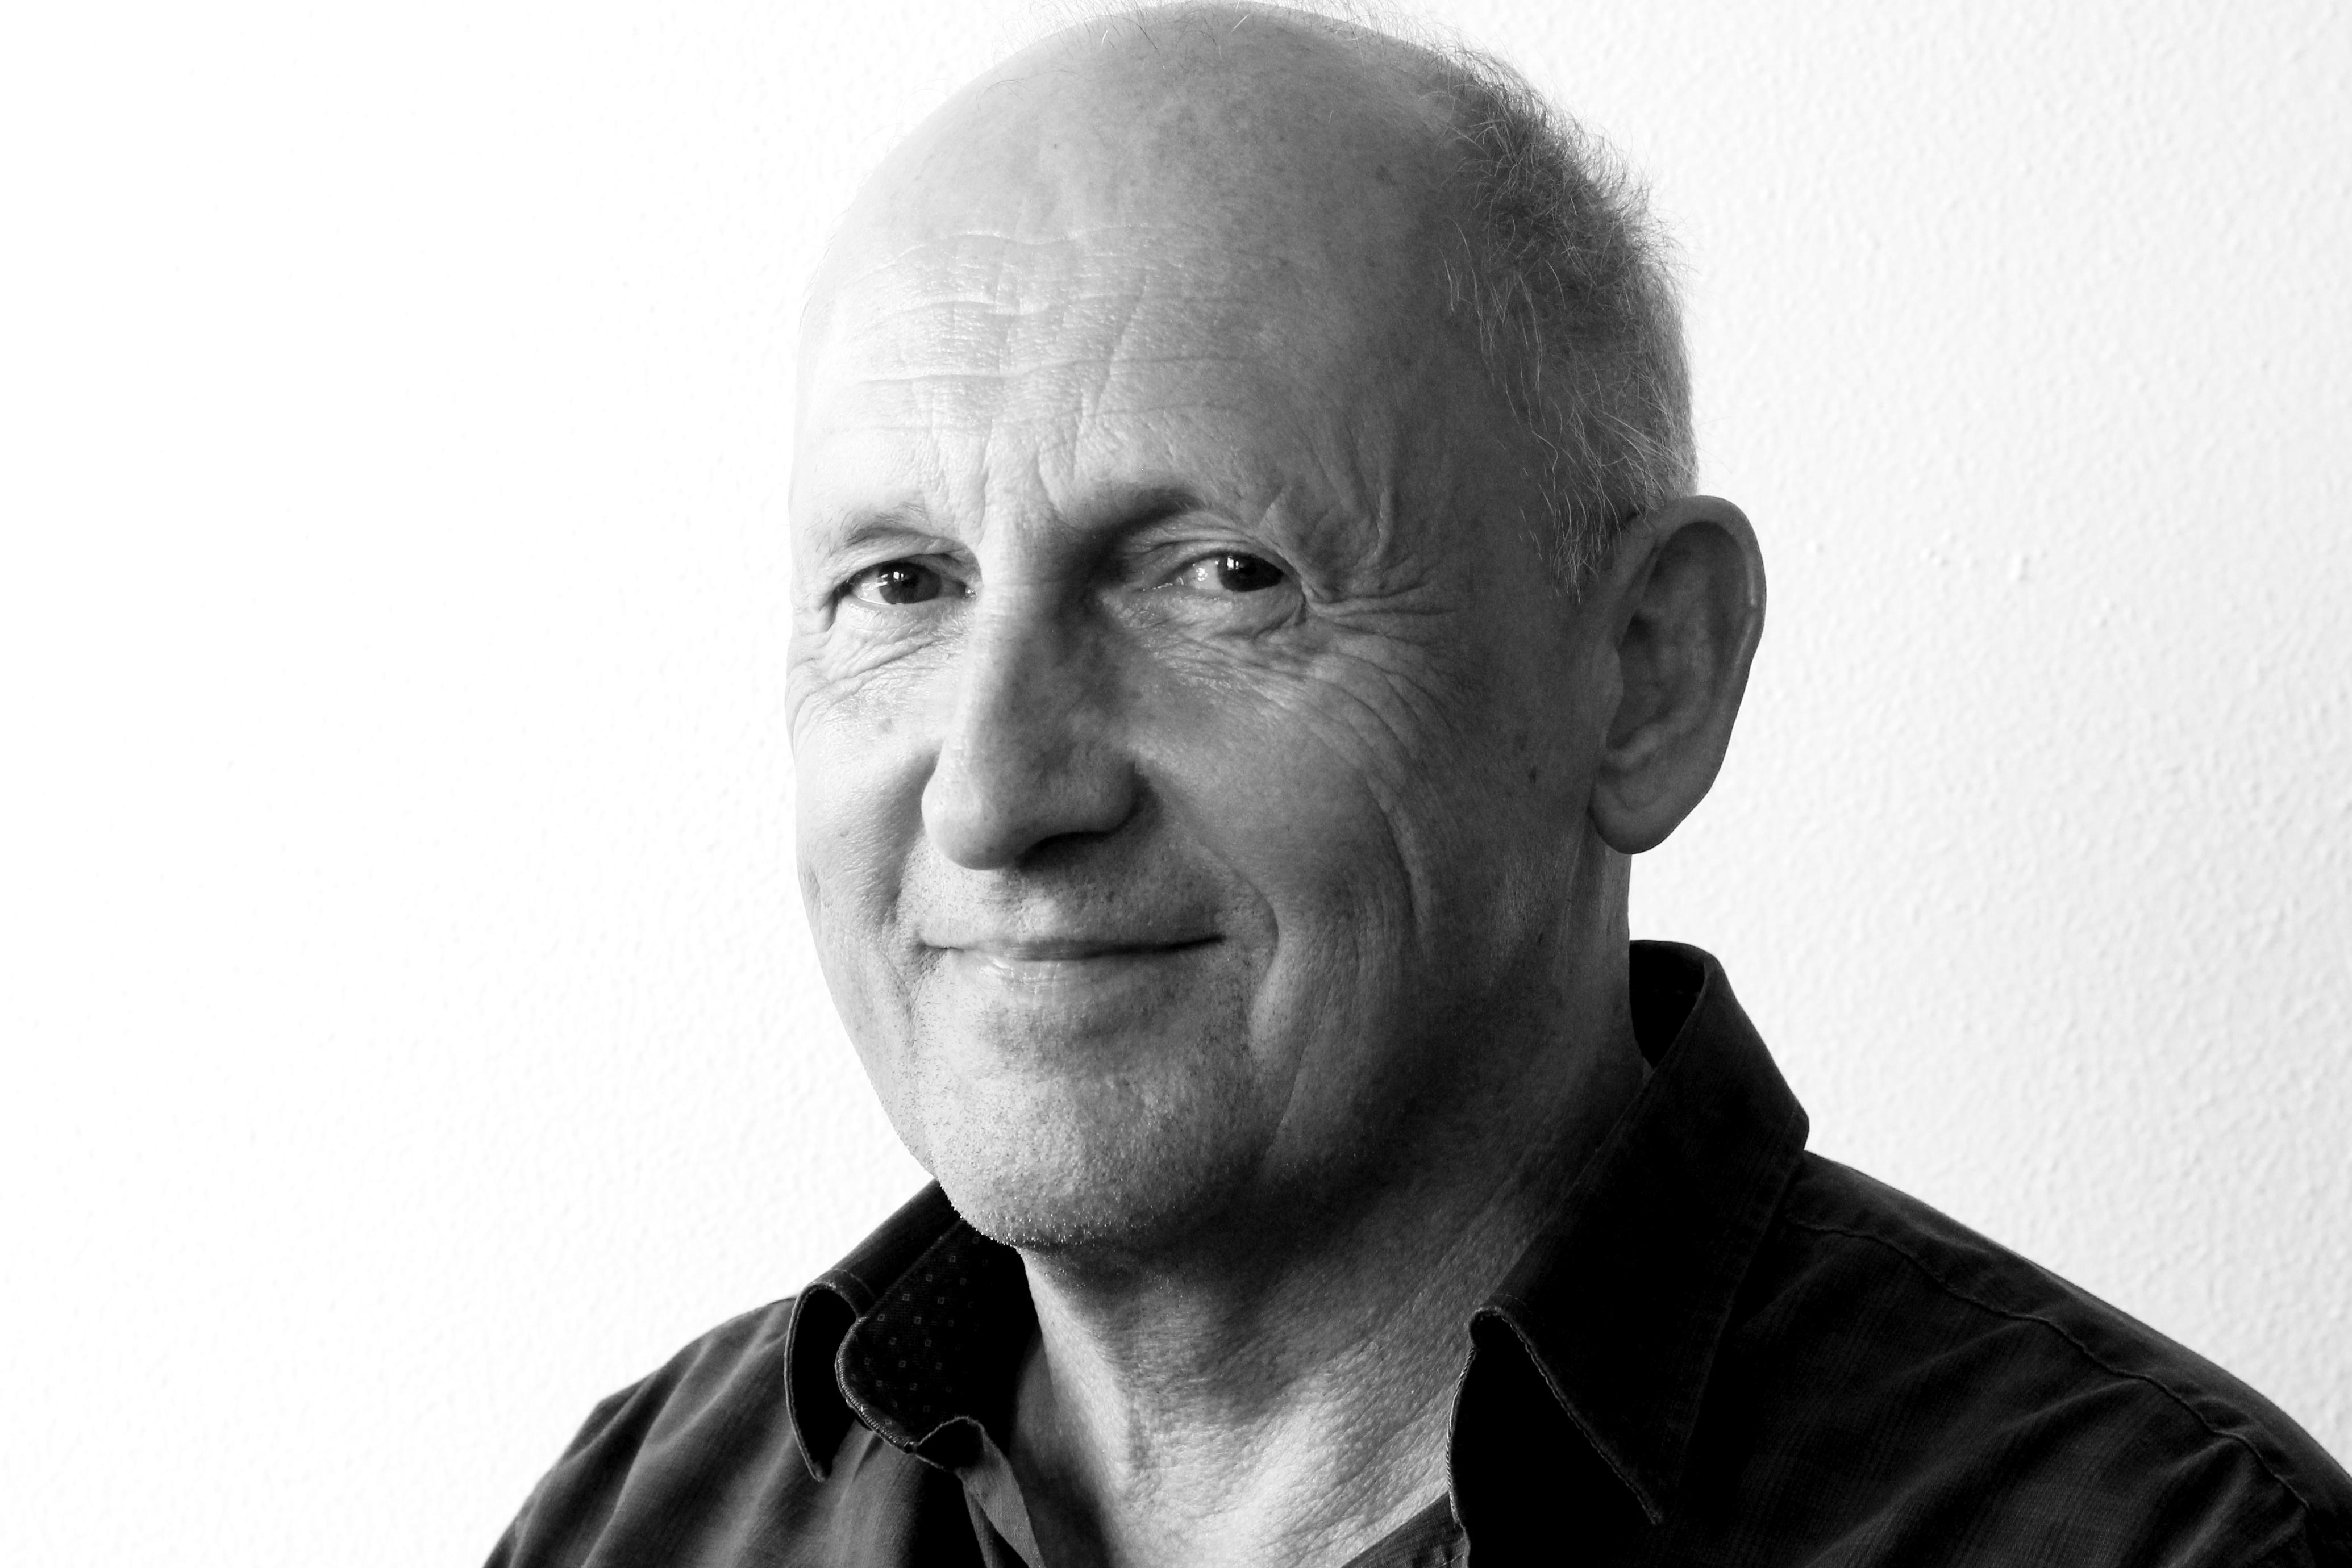 Lars Rasmussen Net Worth